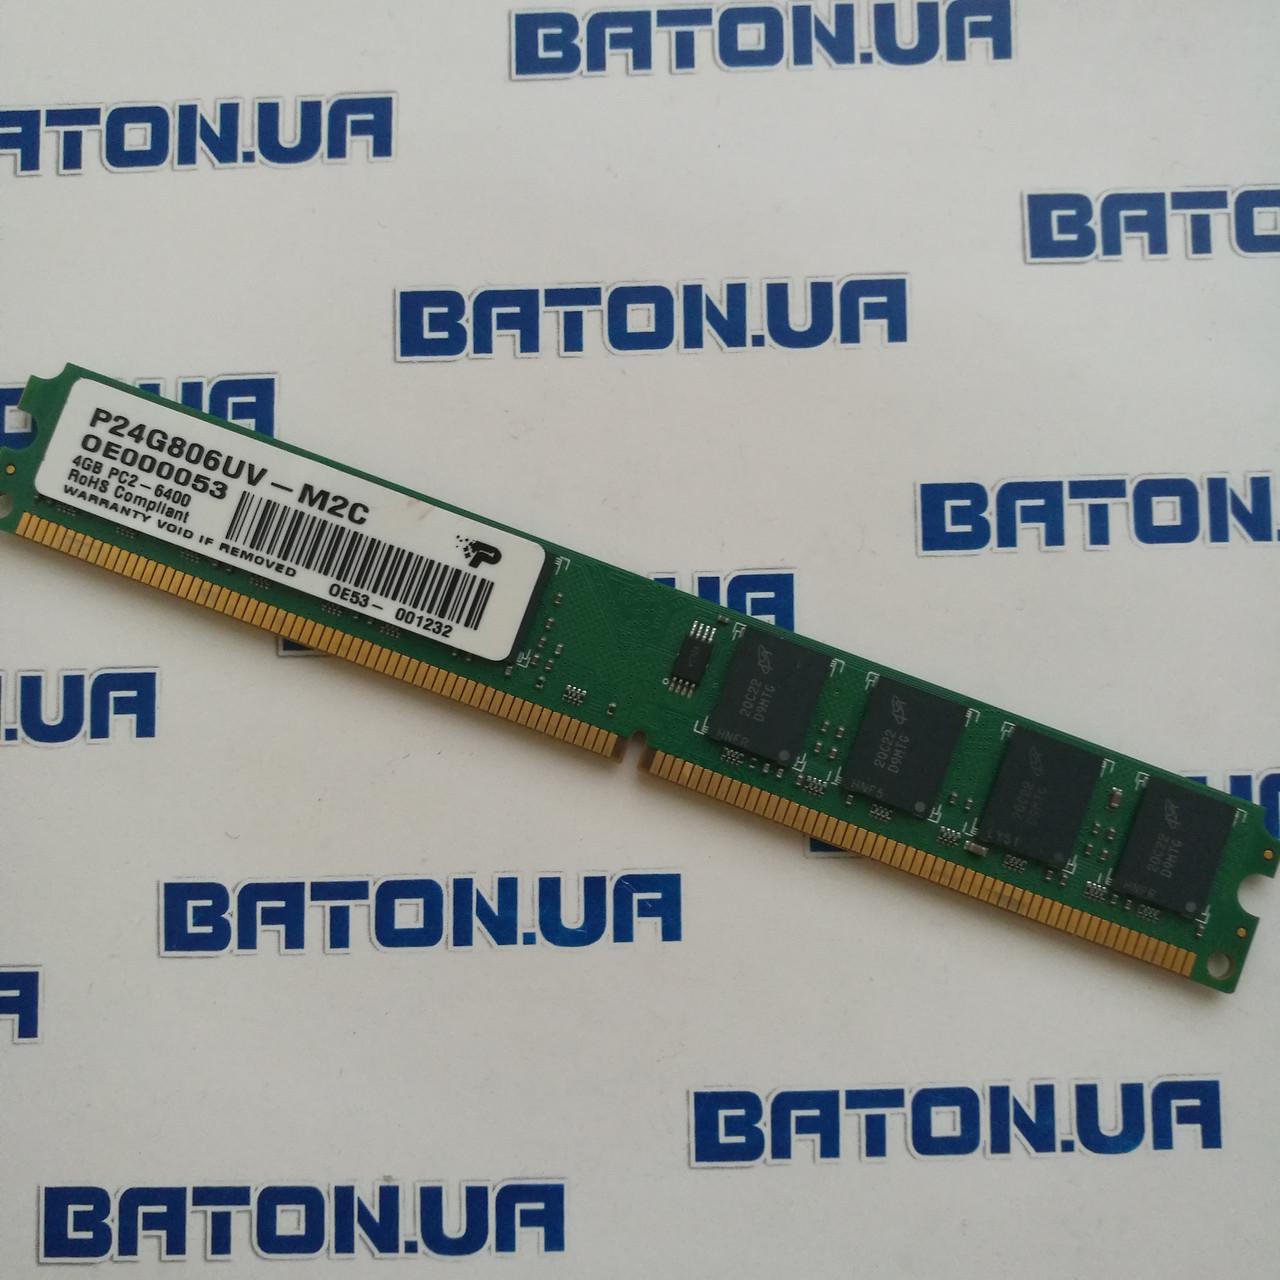 Оперативная память Patriot DDR2 4Gb 800MHz PC2 6400U LP CL6 (P24G806UV-M2C)